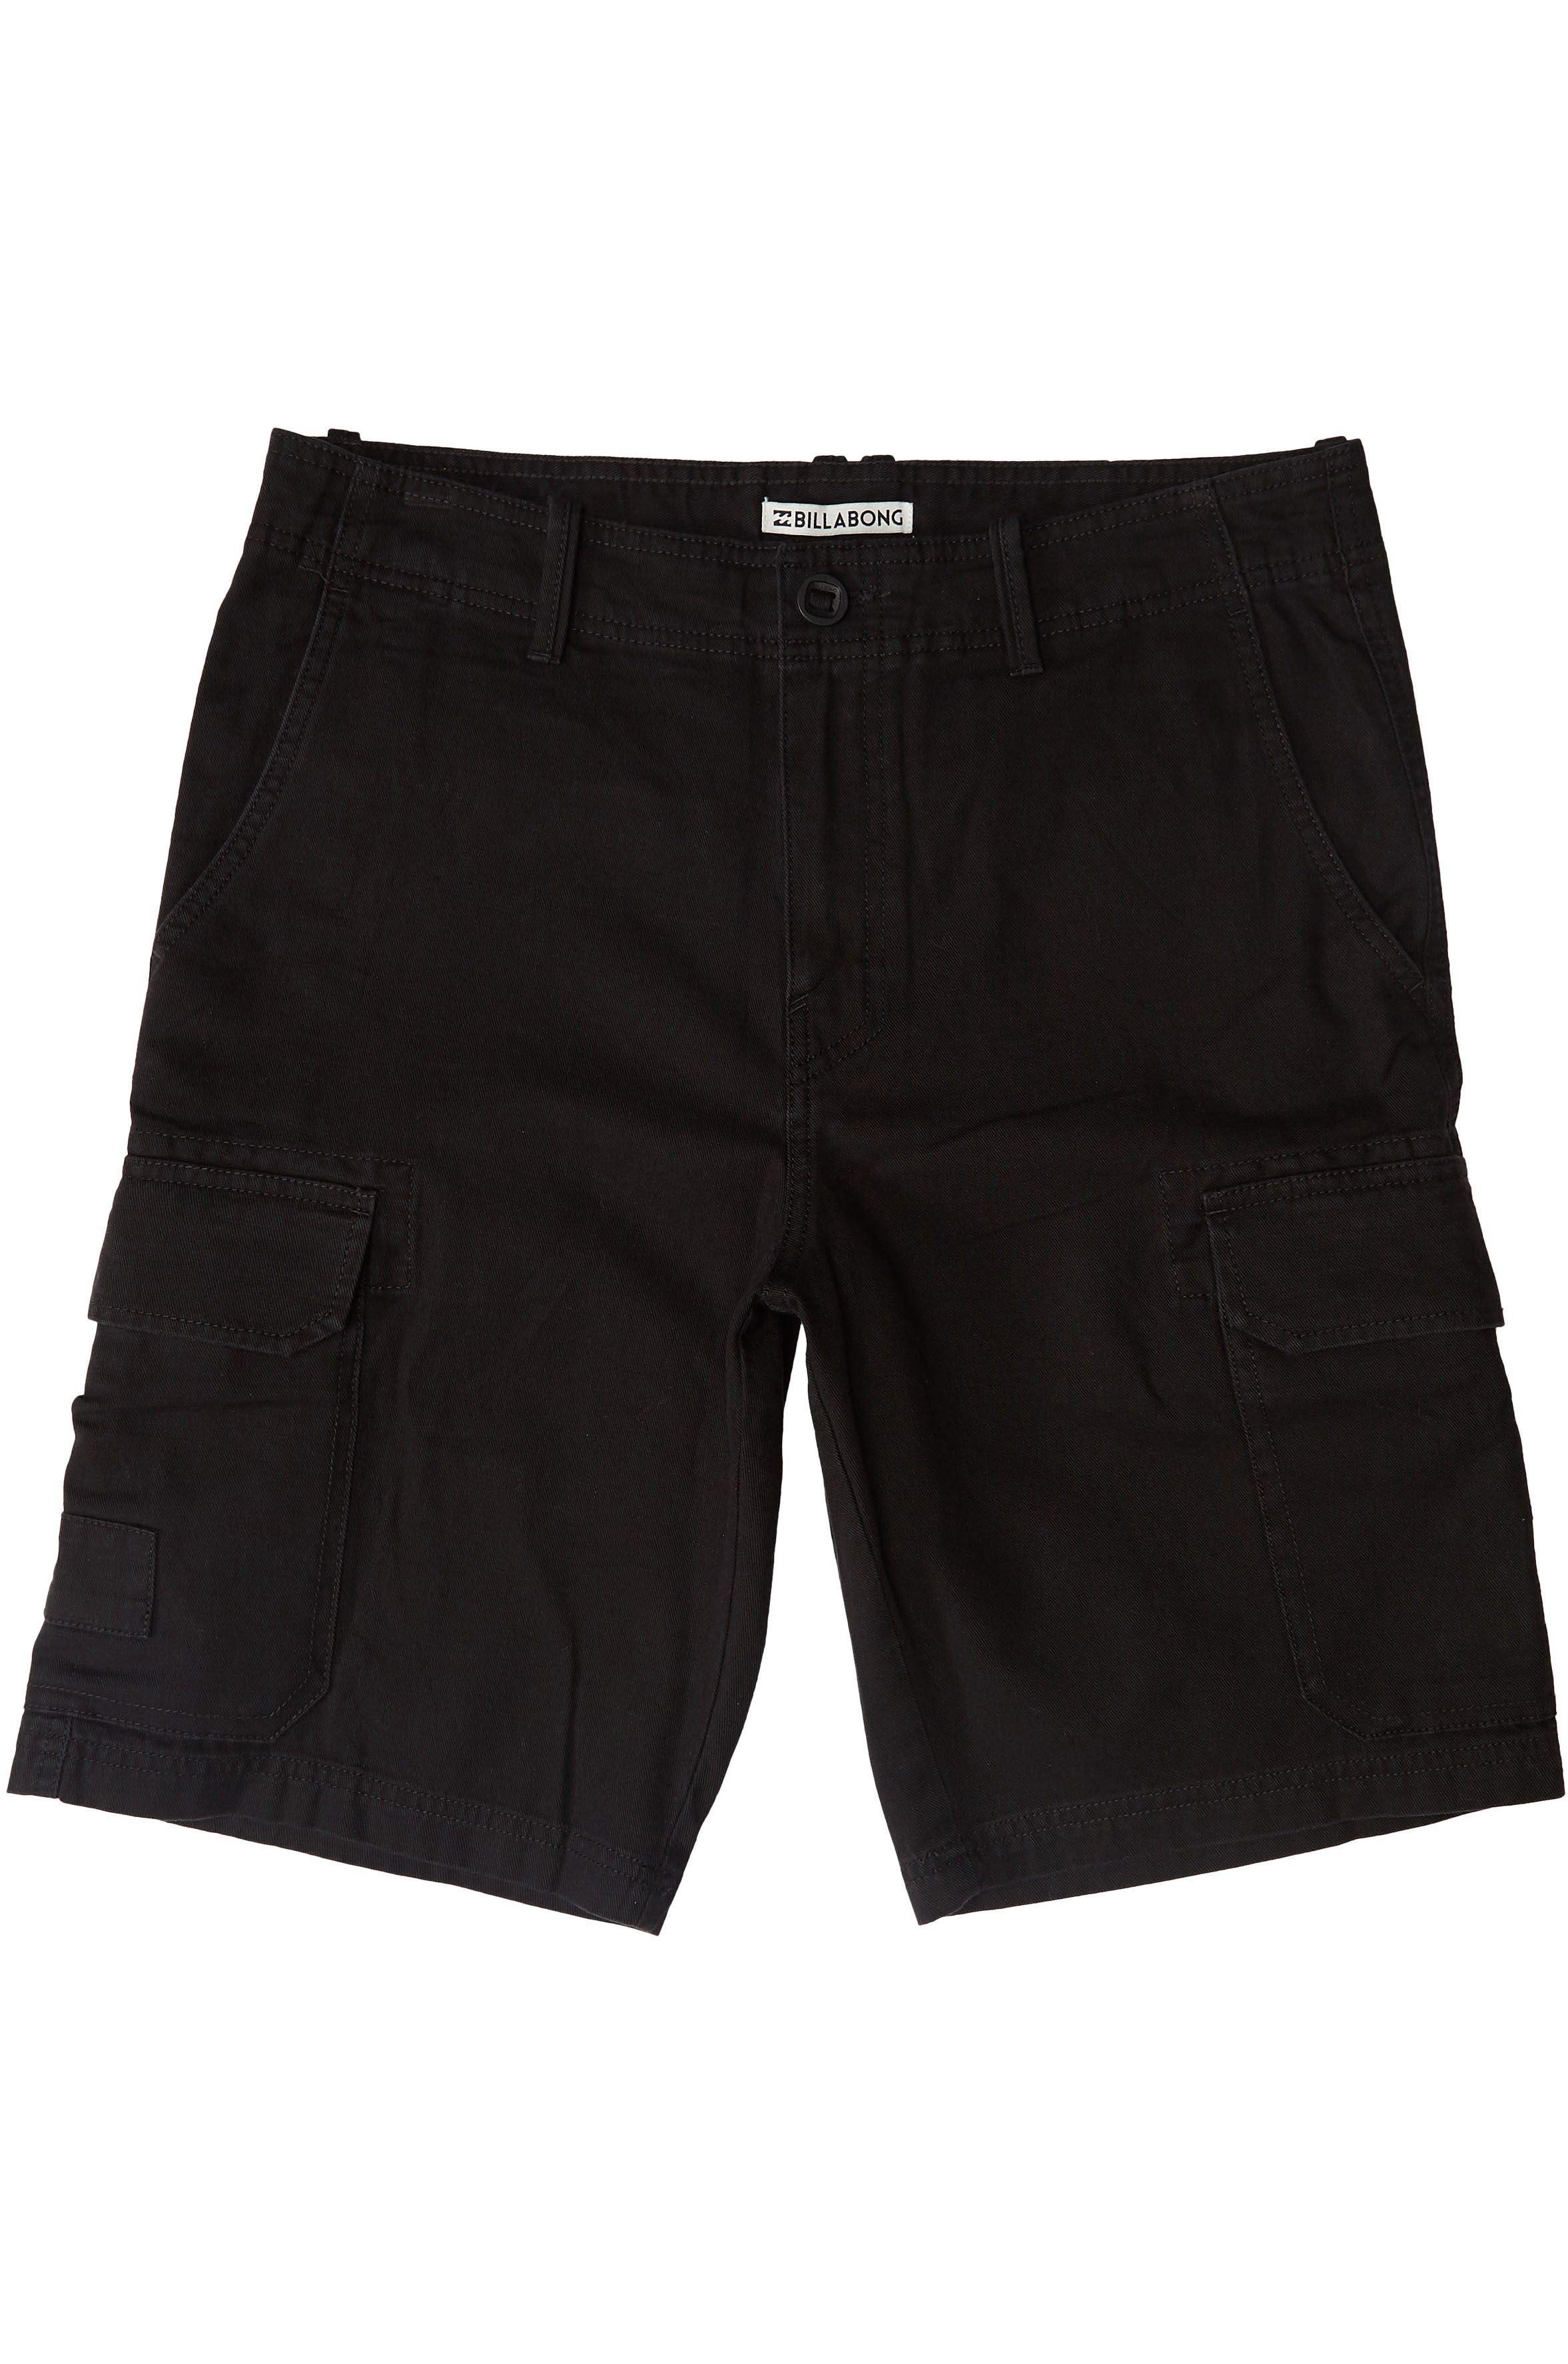 Walkshorts Billabong ALL DAY CARGO Black